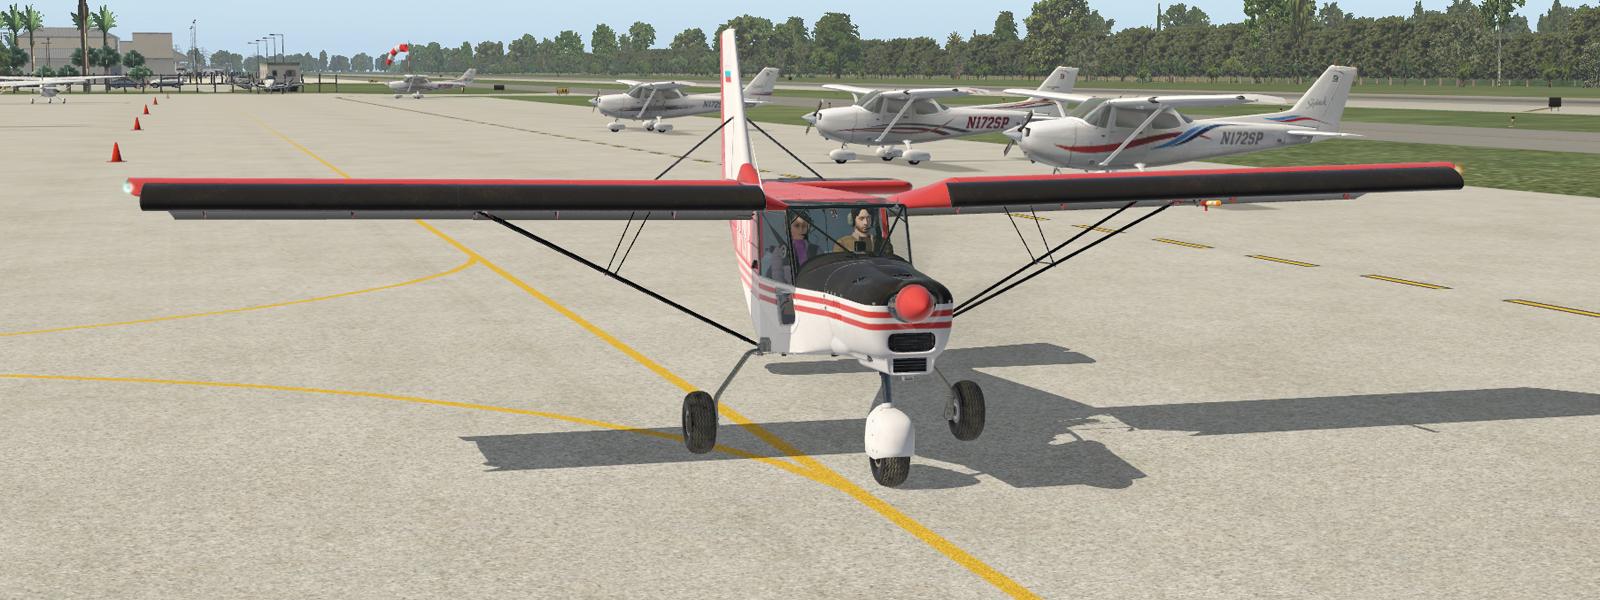 Spectr-AeroSP-30